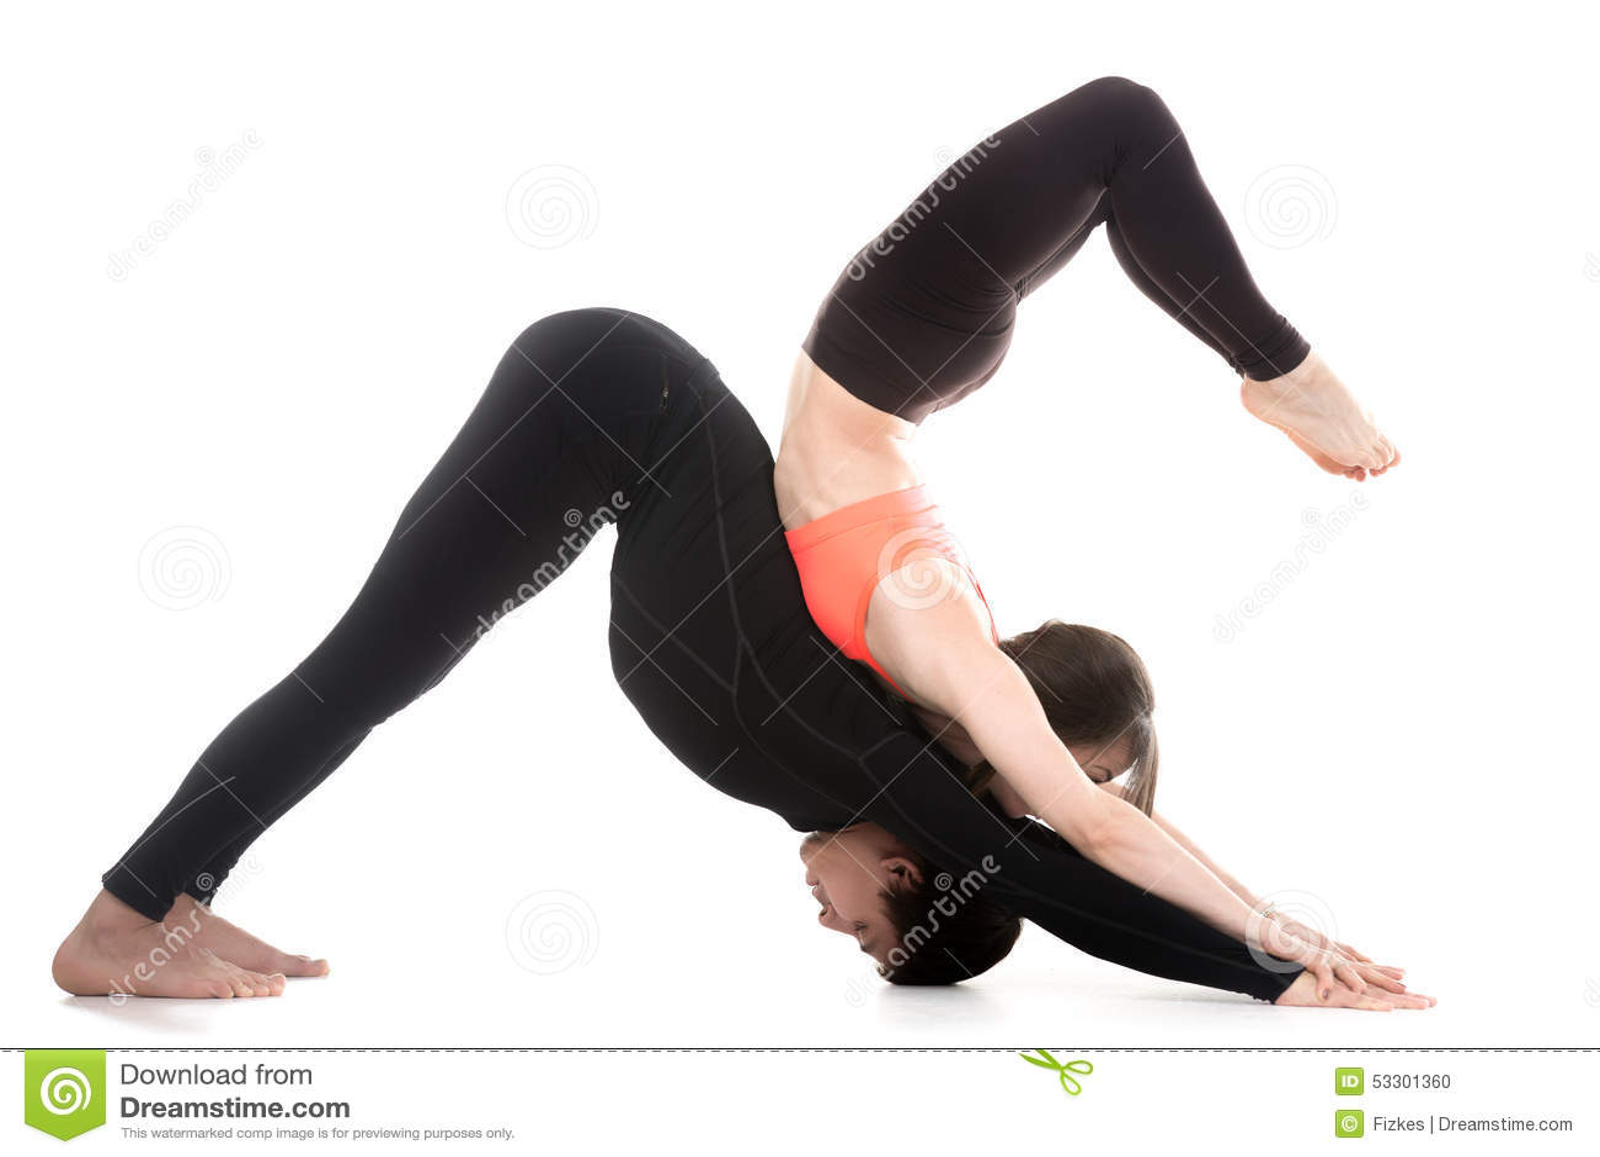 Top Acroyoga, Downward-facing Dog Yoga Pose Stock Photo - Image: 53301388 XC83